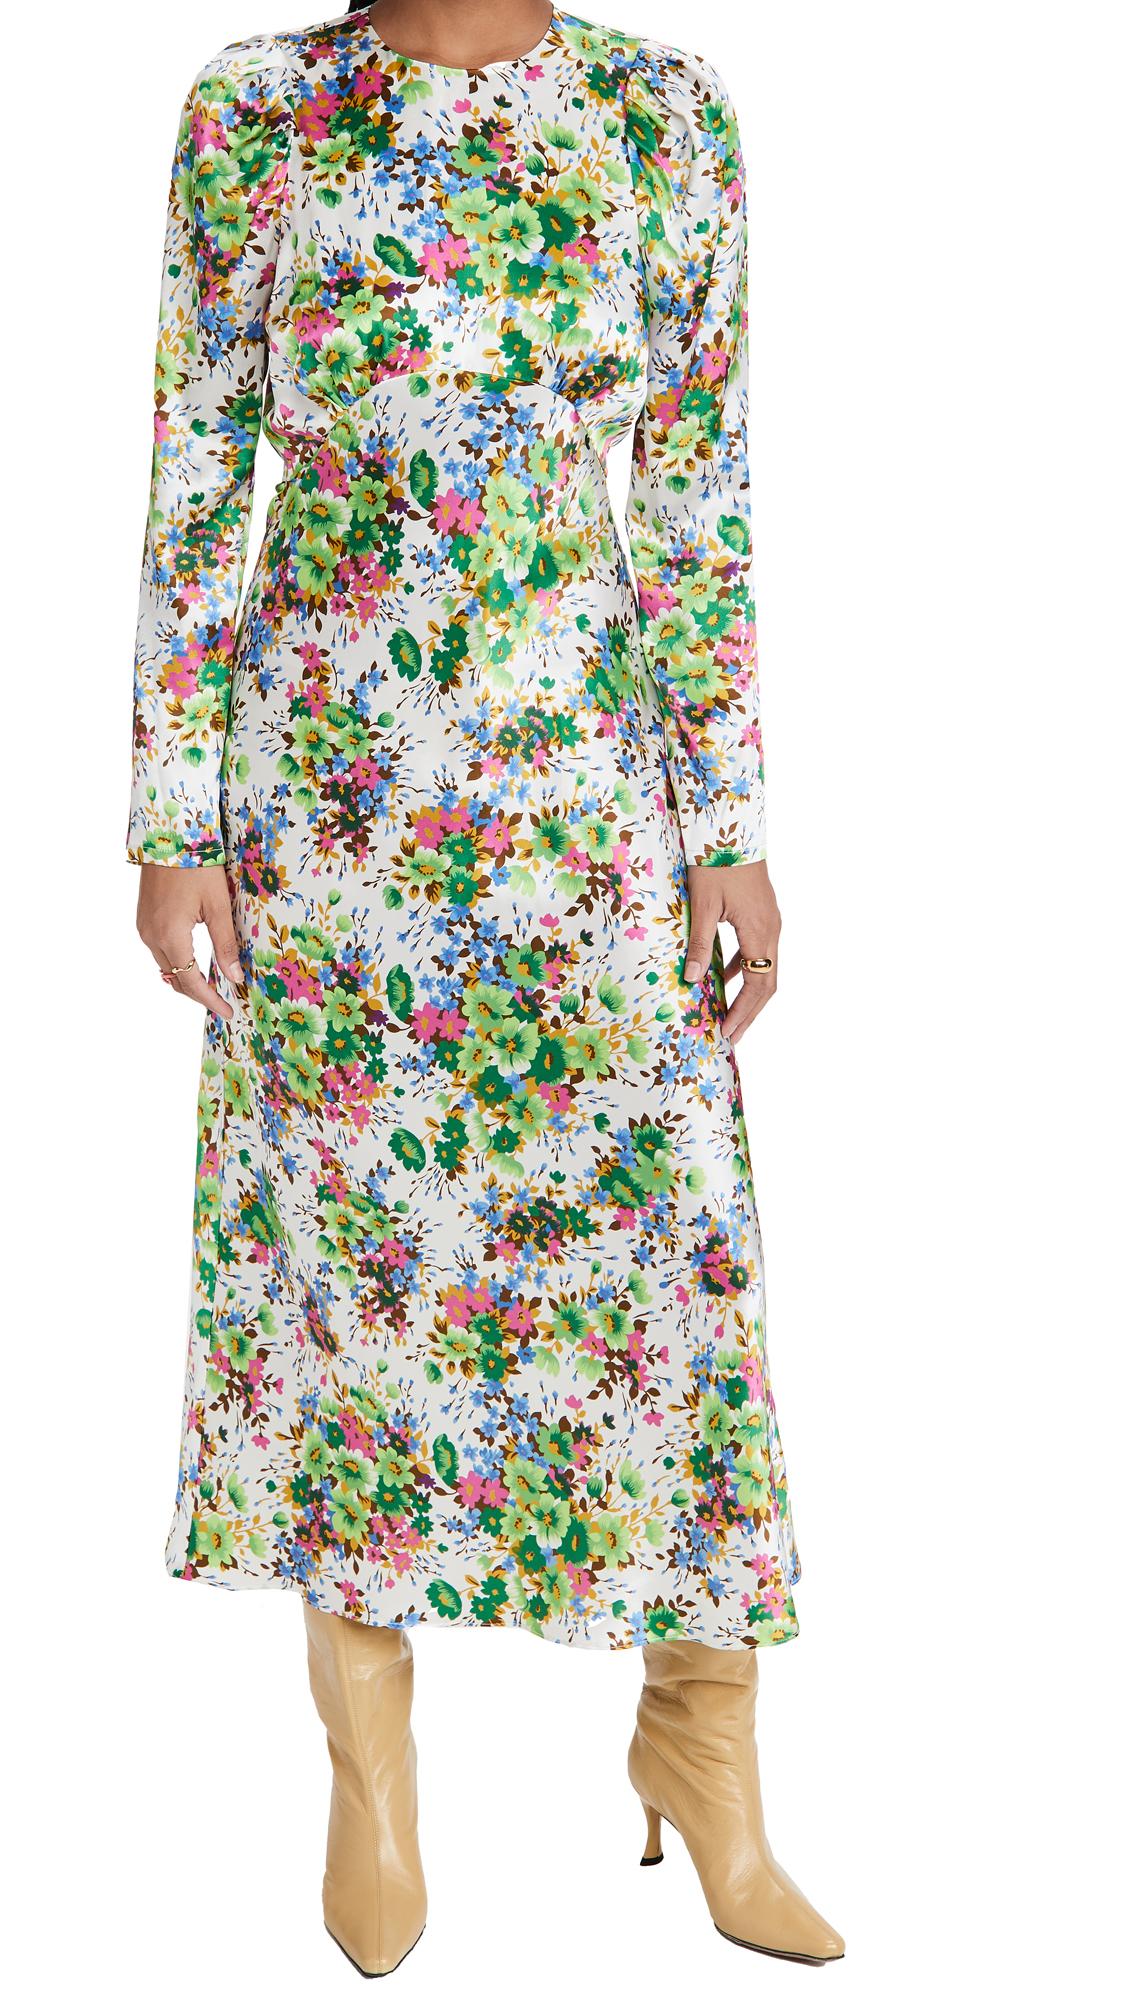 LES REVERIES Pleated Puff Sleeve Bias Dress